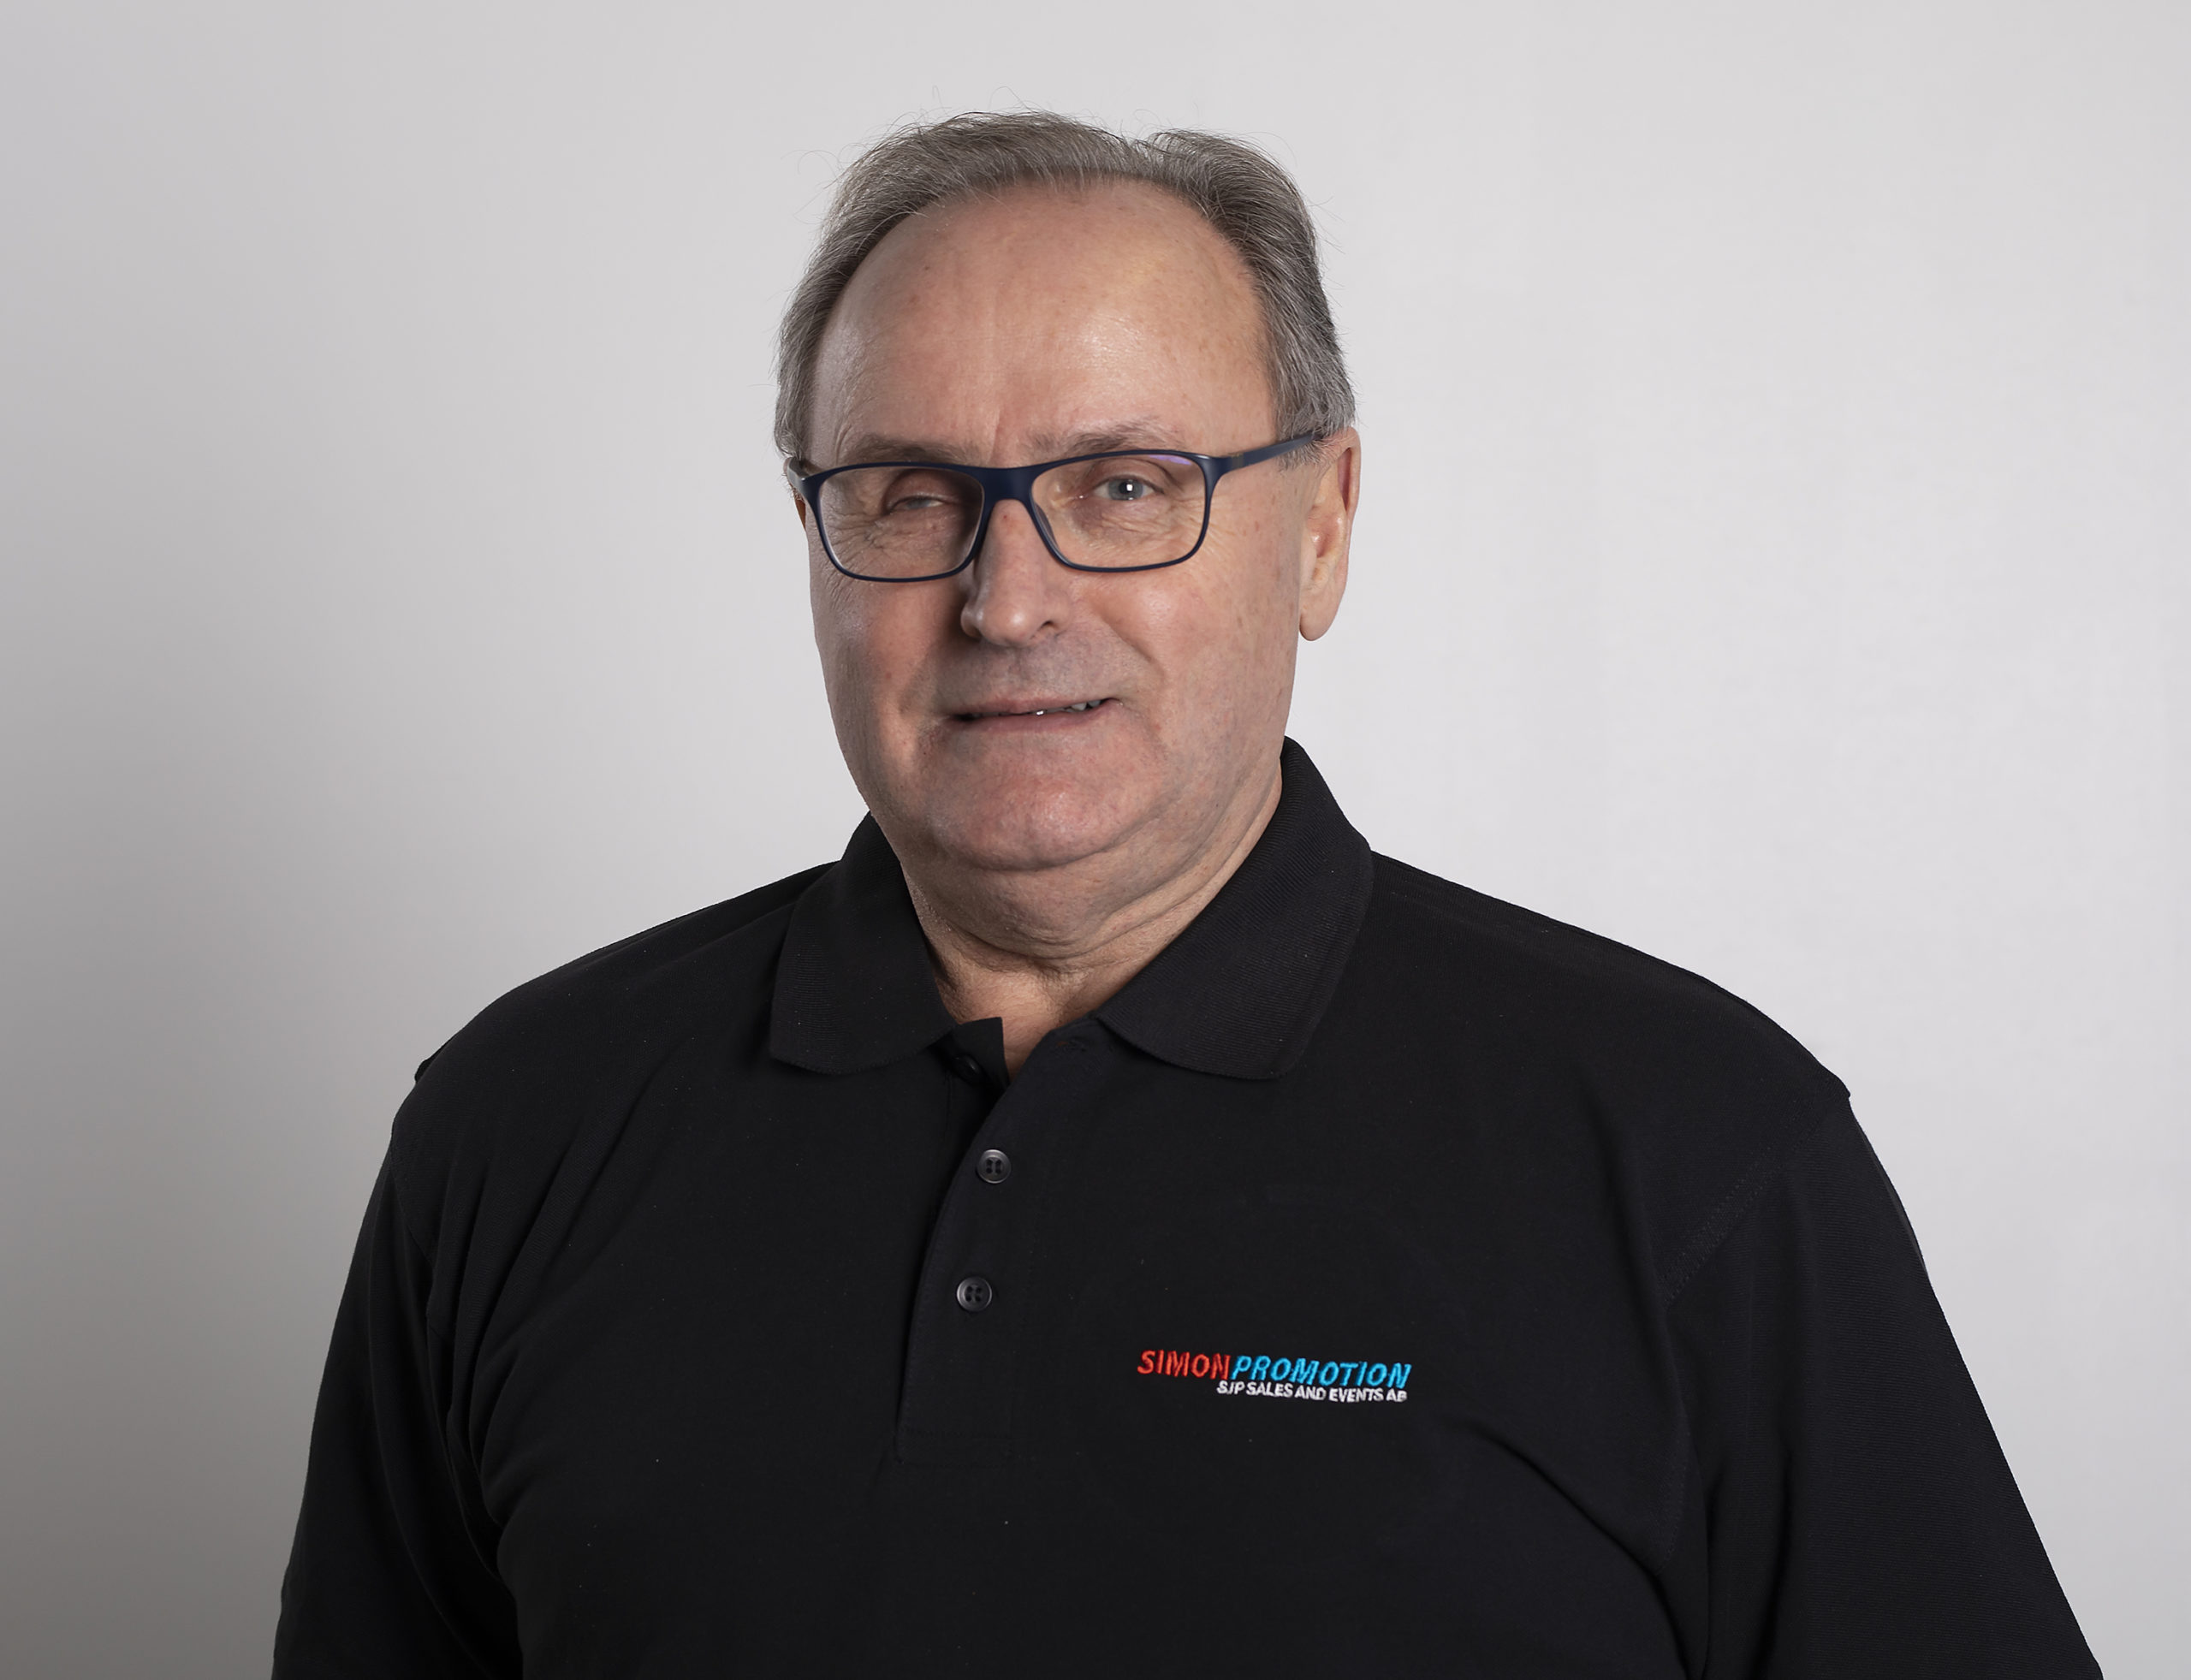 Simon Promotion, december 2020, Foto: Micke Fransson